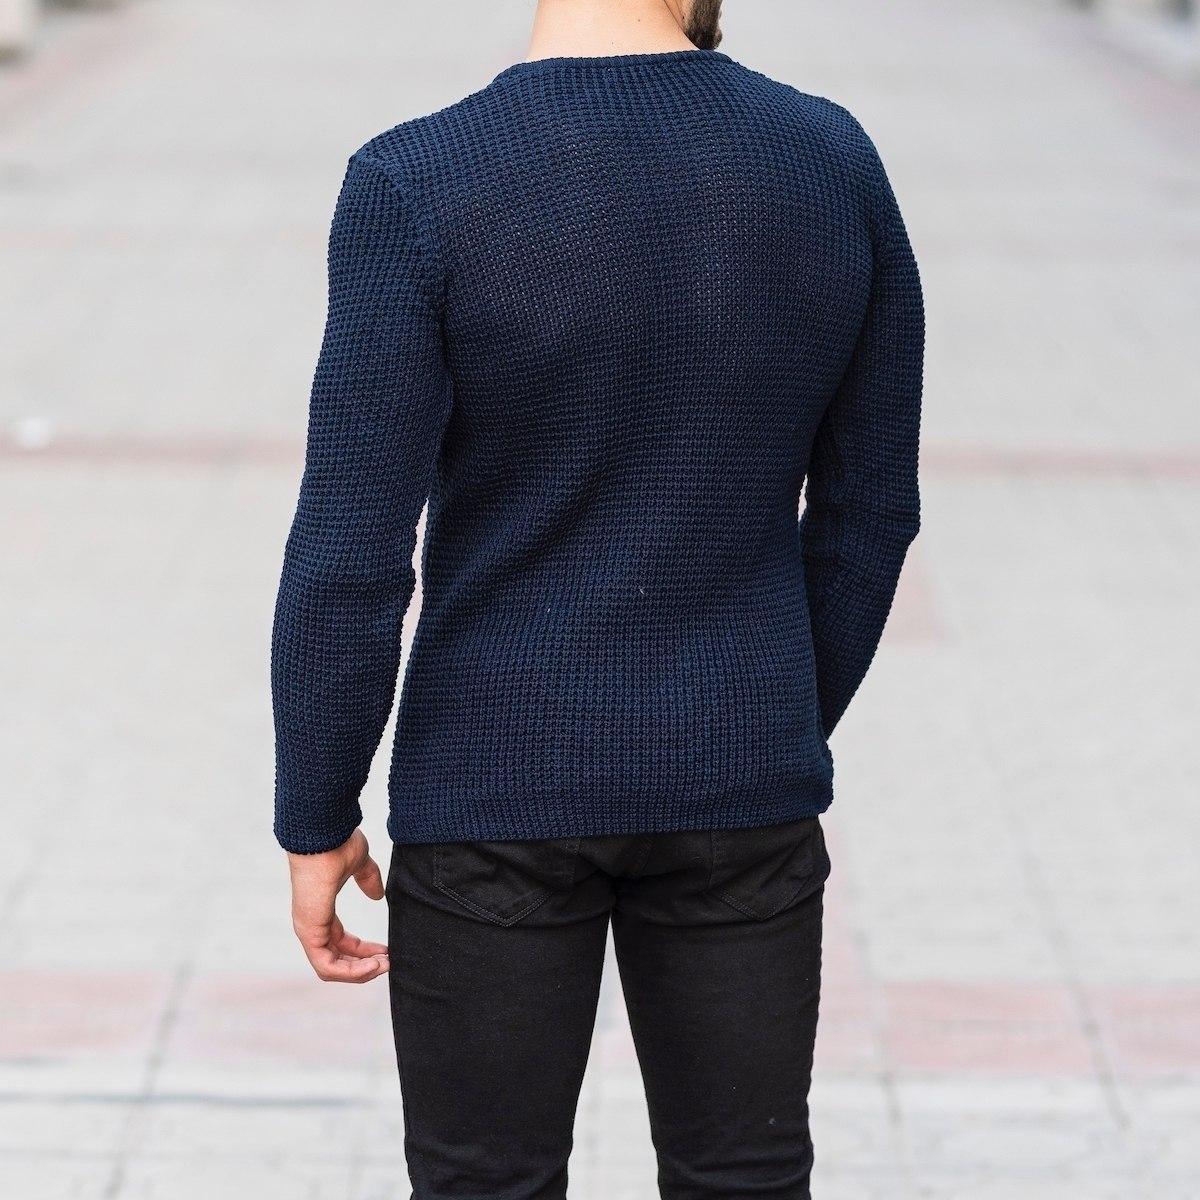 Knitted Pullover In Navy Blue Mv Premium Brand - 4